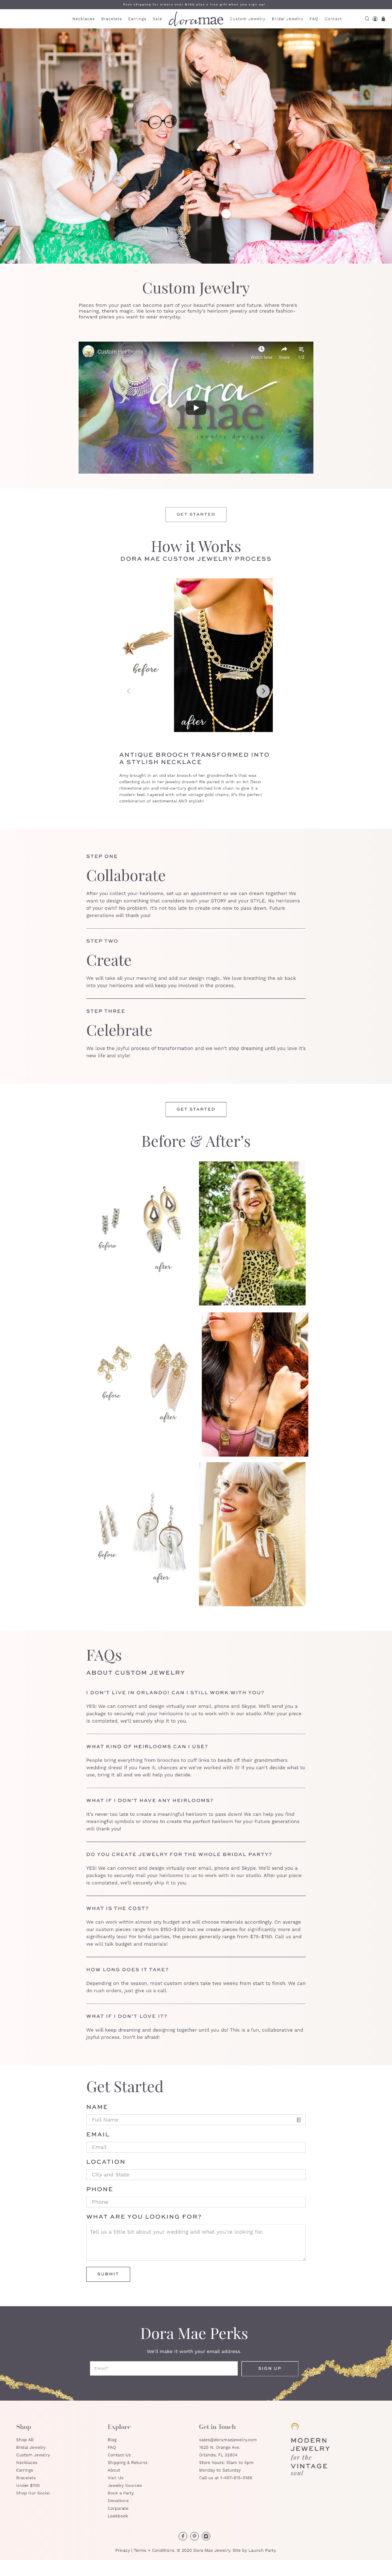 dora mae jewelry custom page new website shopify design screenshot